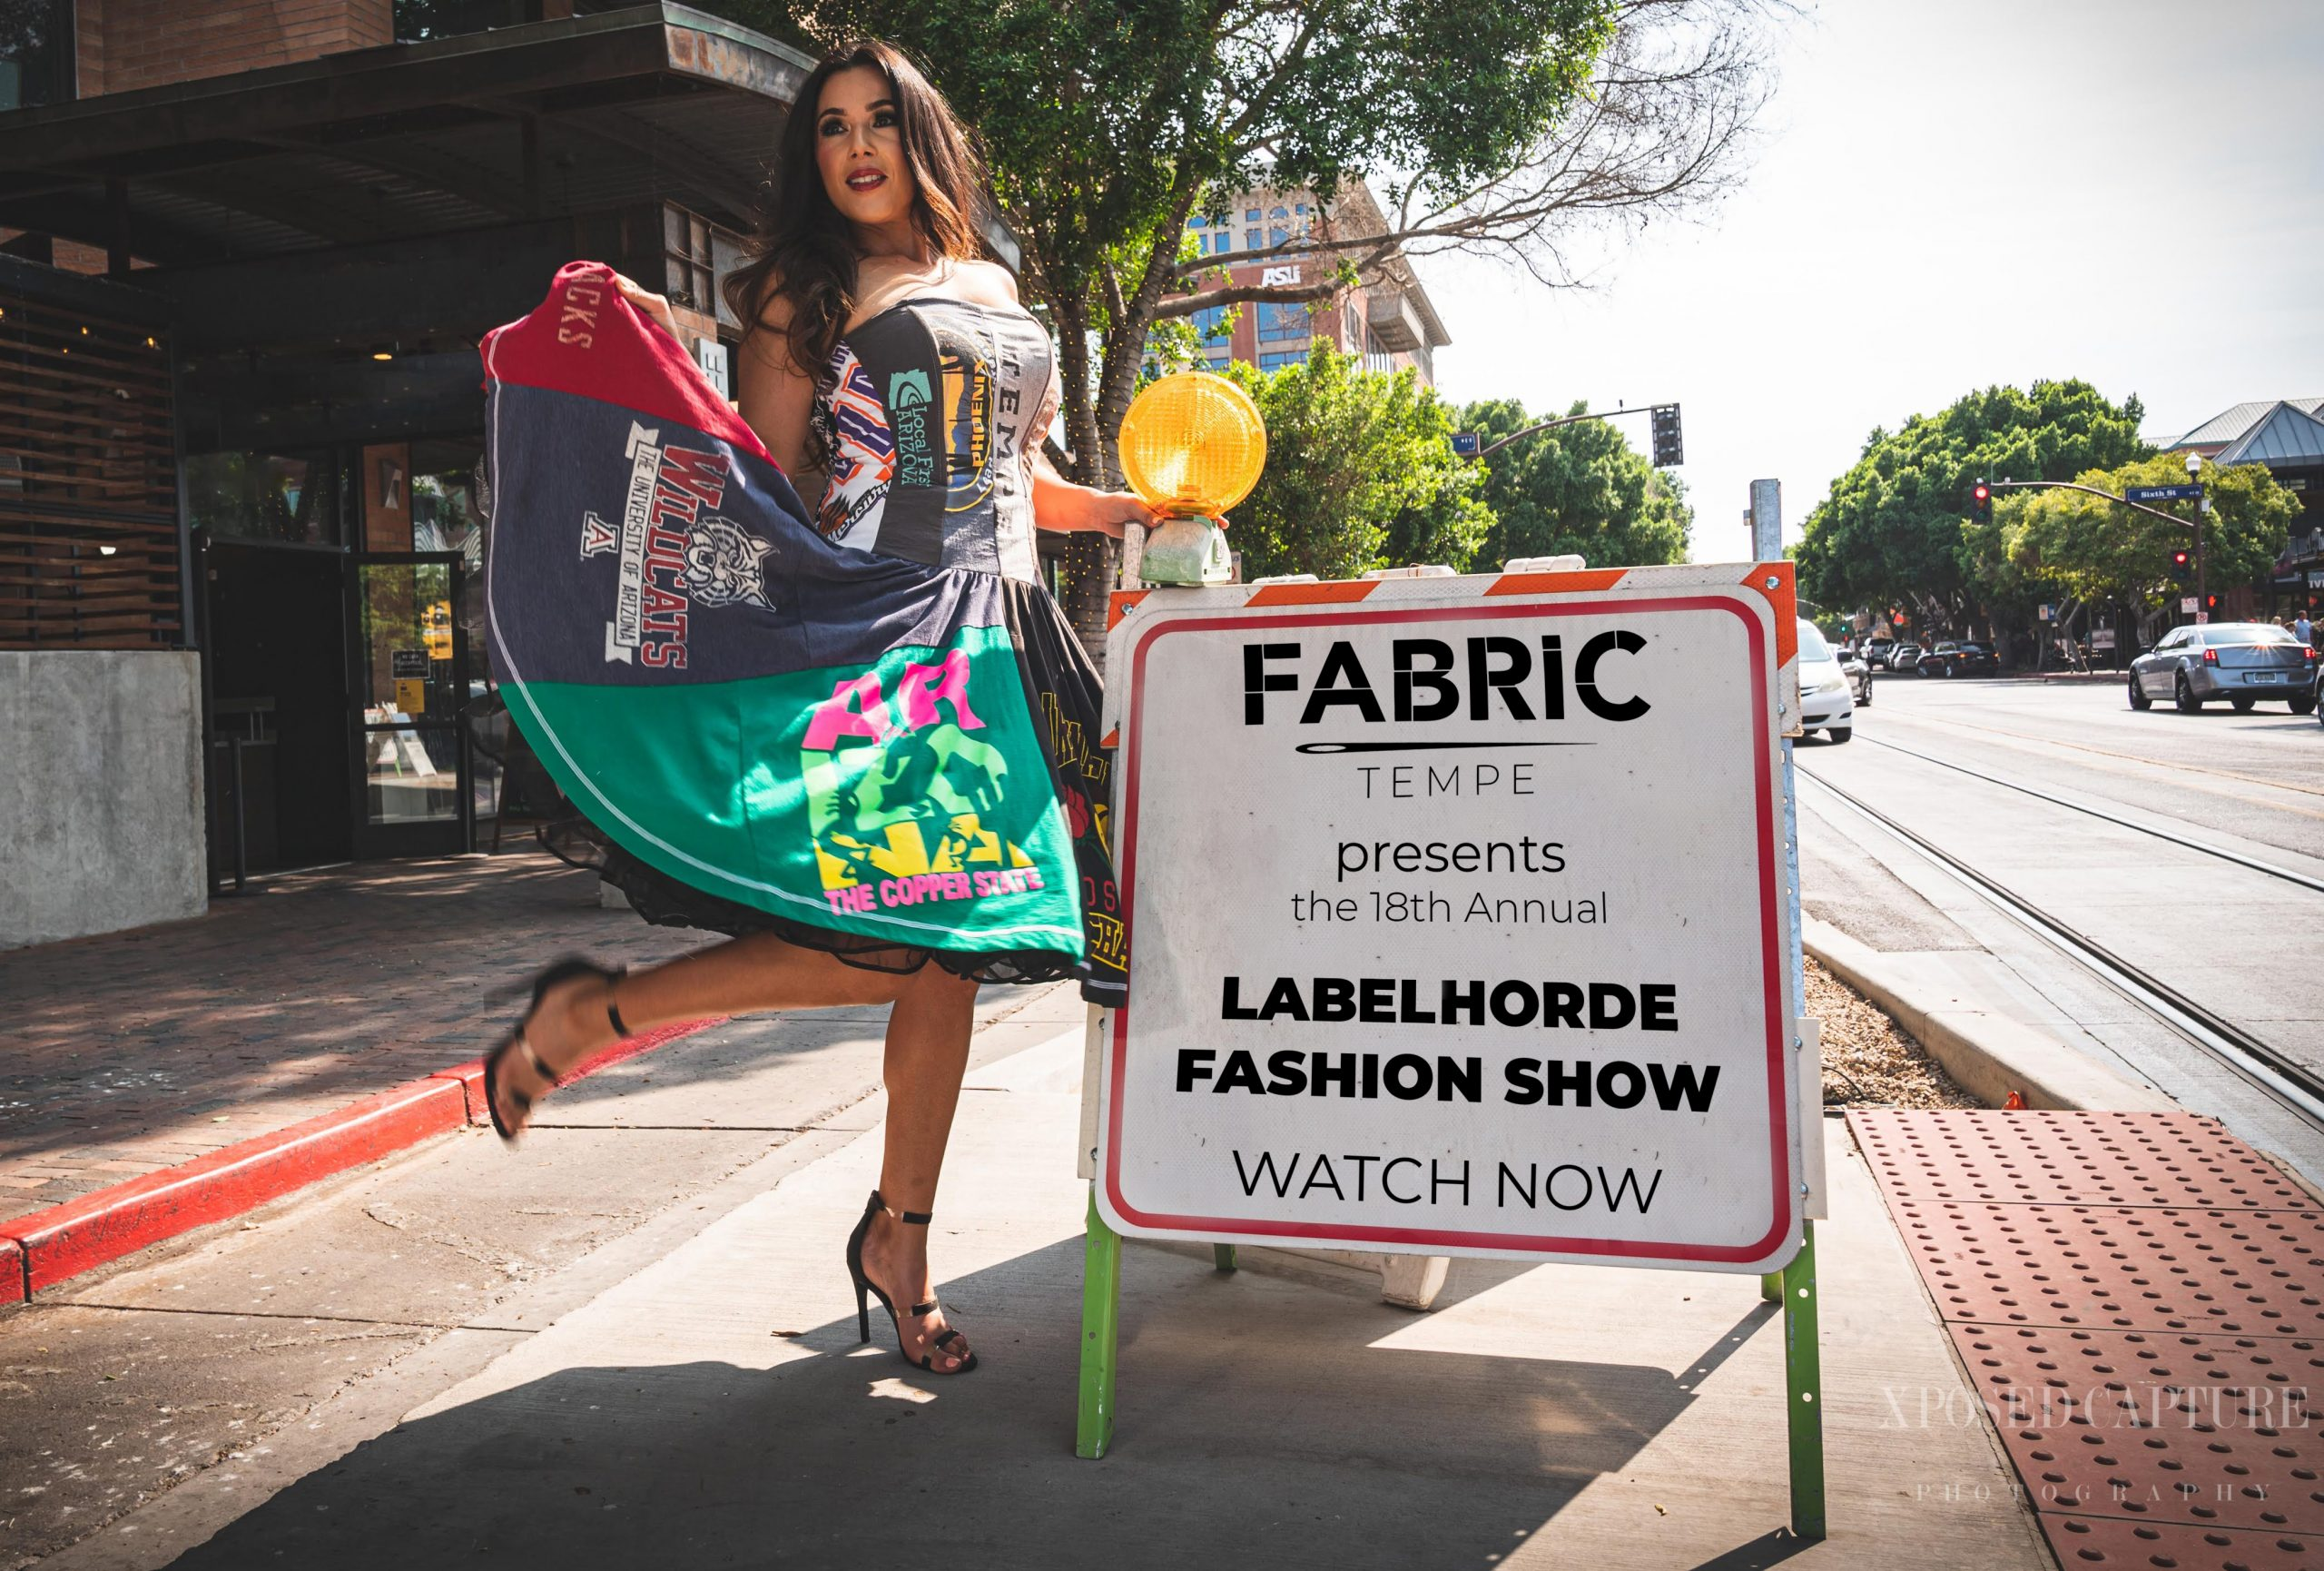 LabelHorde Fashion Show Film